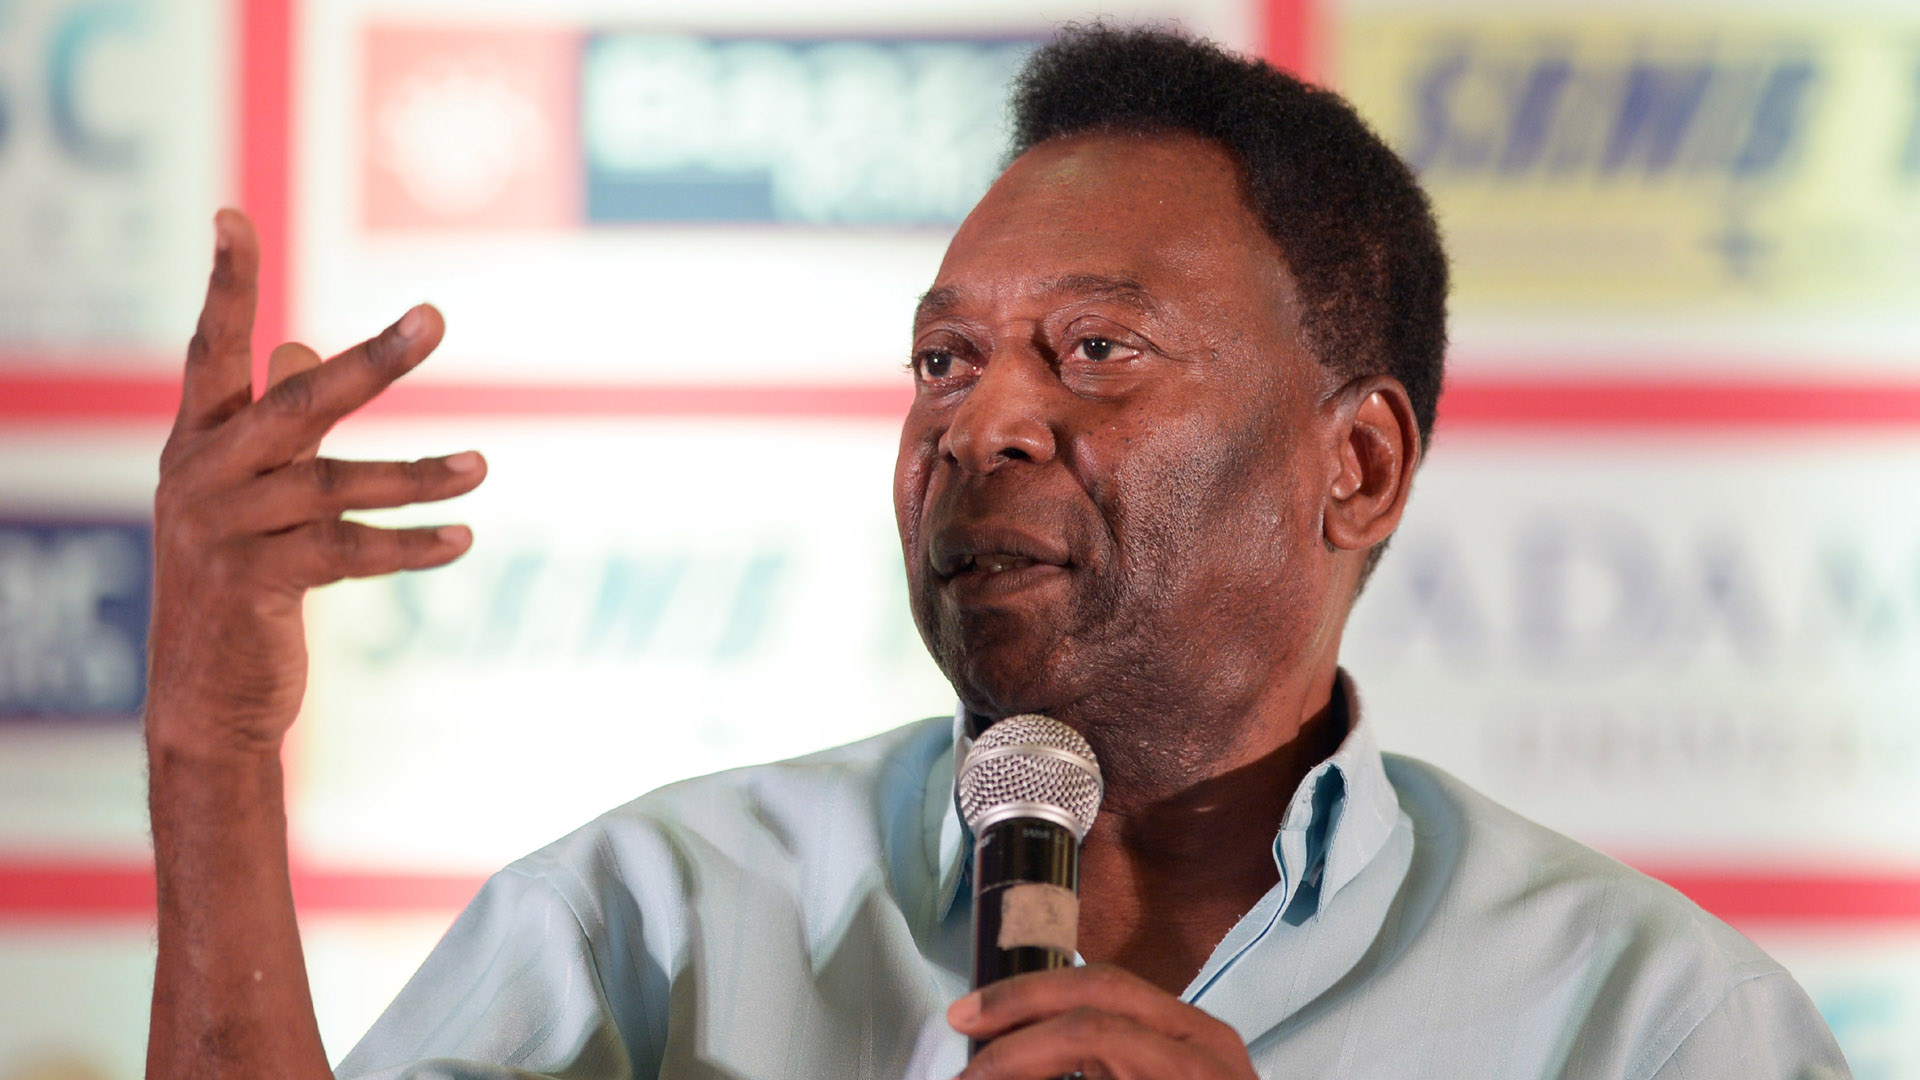 Pele attends a press conference in Kolkata